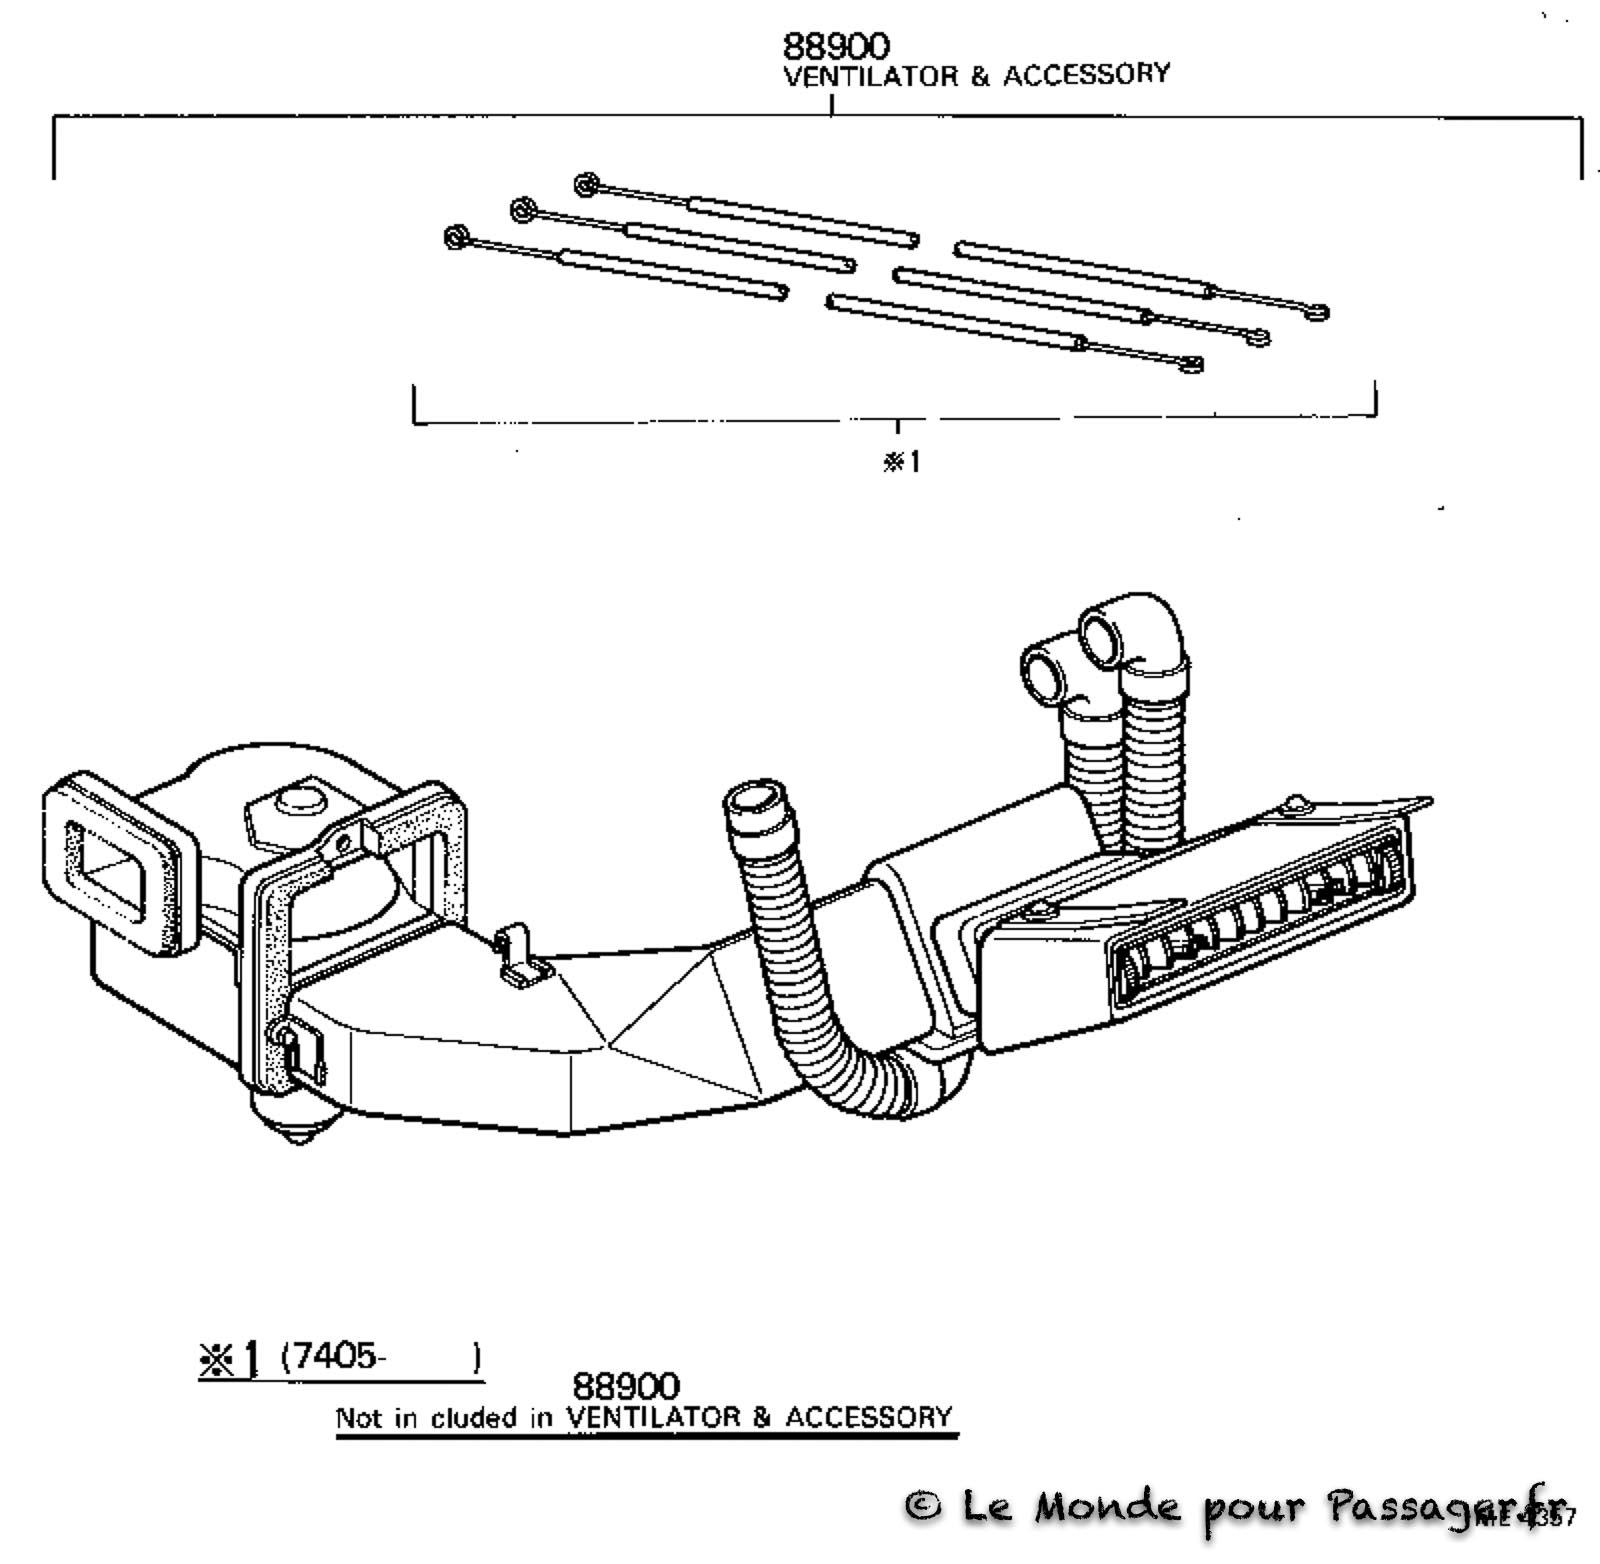 Fj55-Eclatés-Techniques002